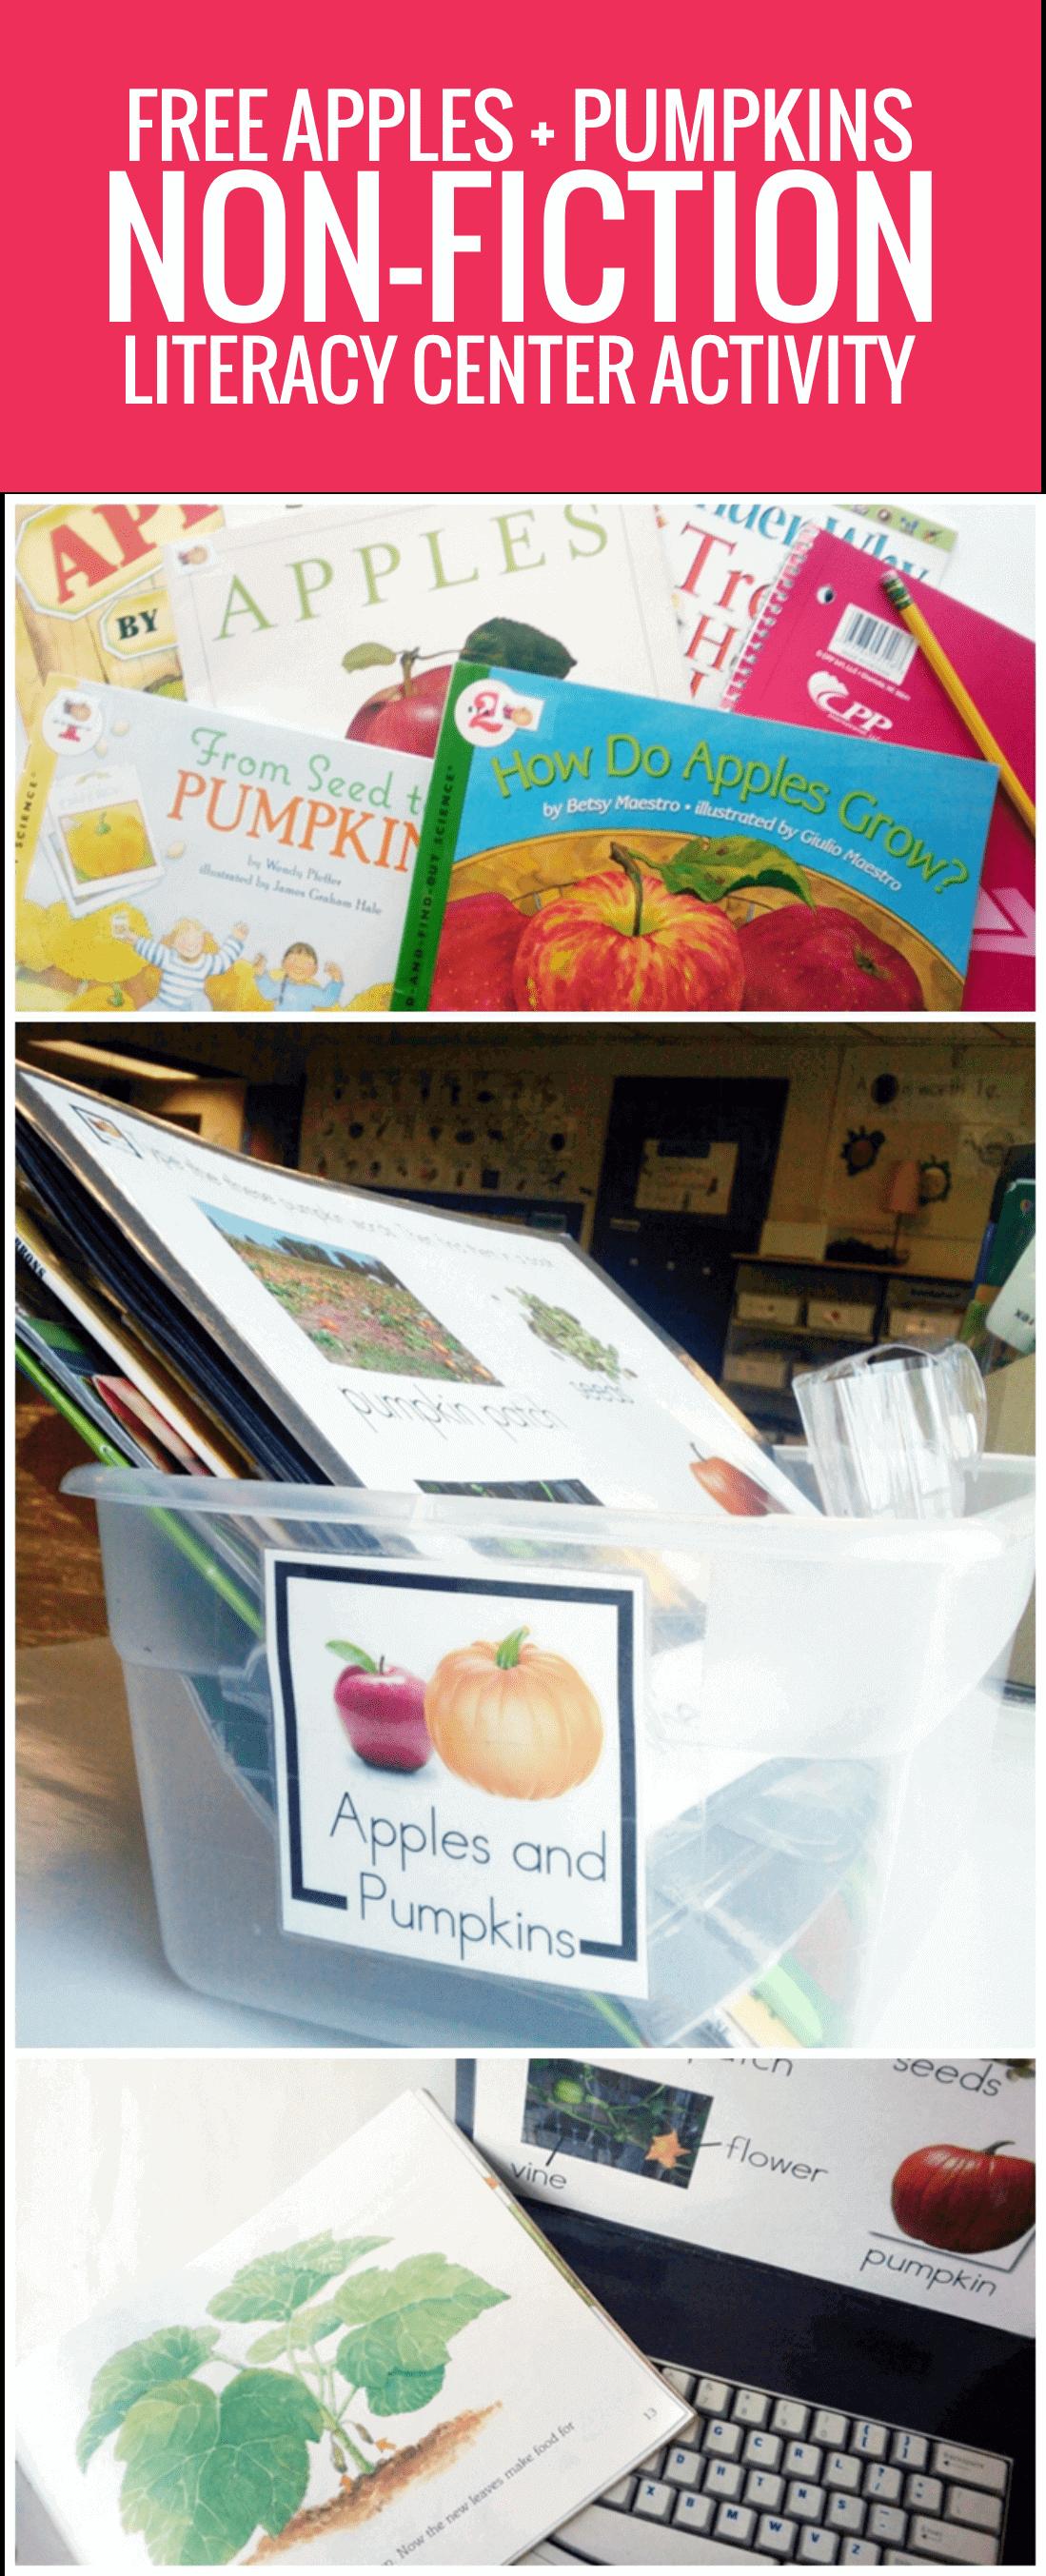 Apples and Pumpkins Non-fiction Literacy Center Activity Set